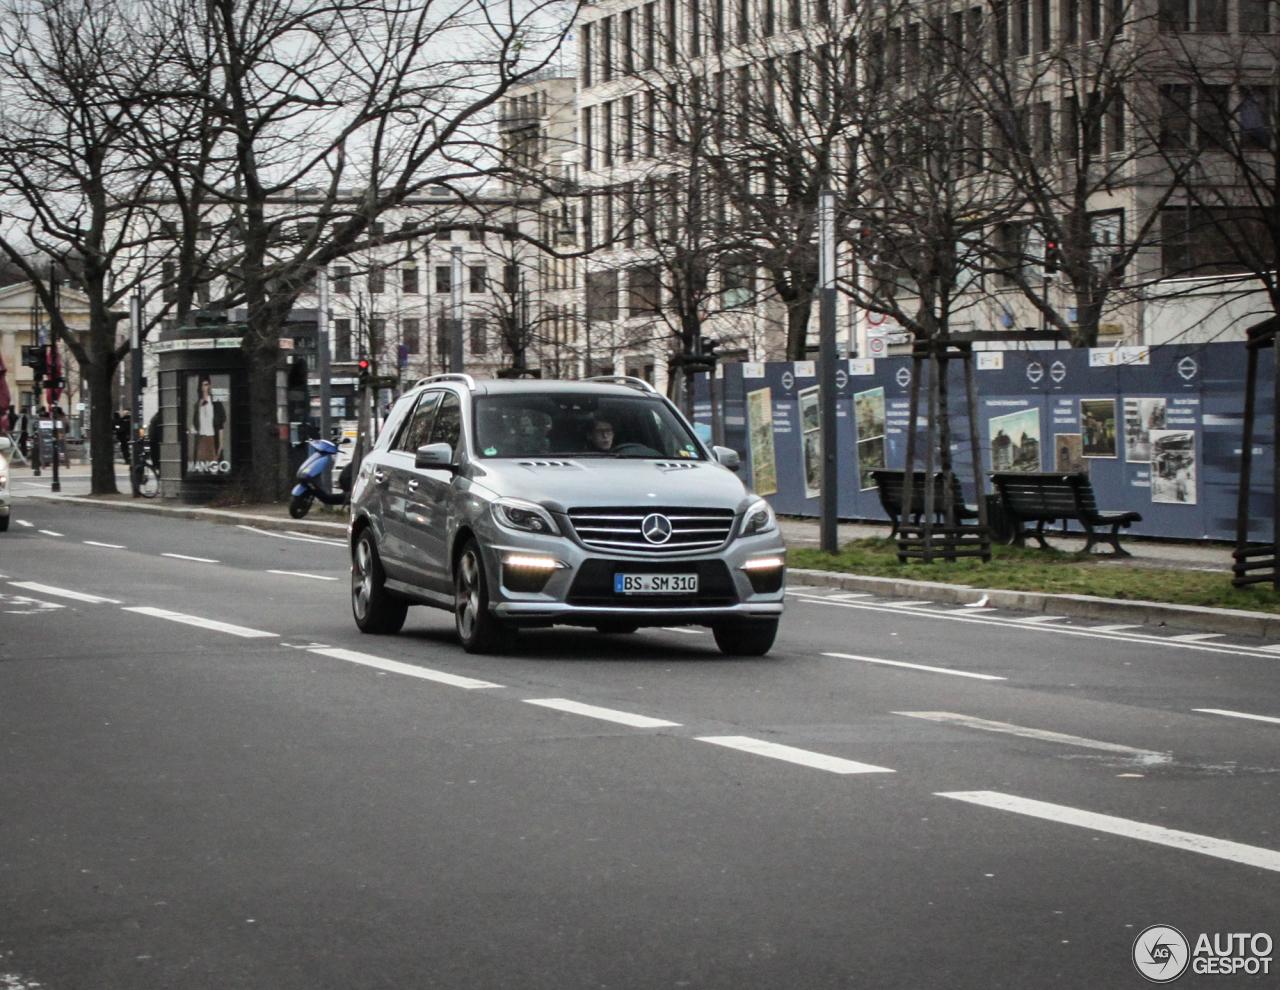 Mercedes-Benz ML 63 AMG W166 2